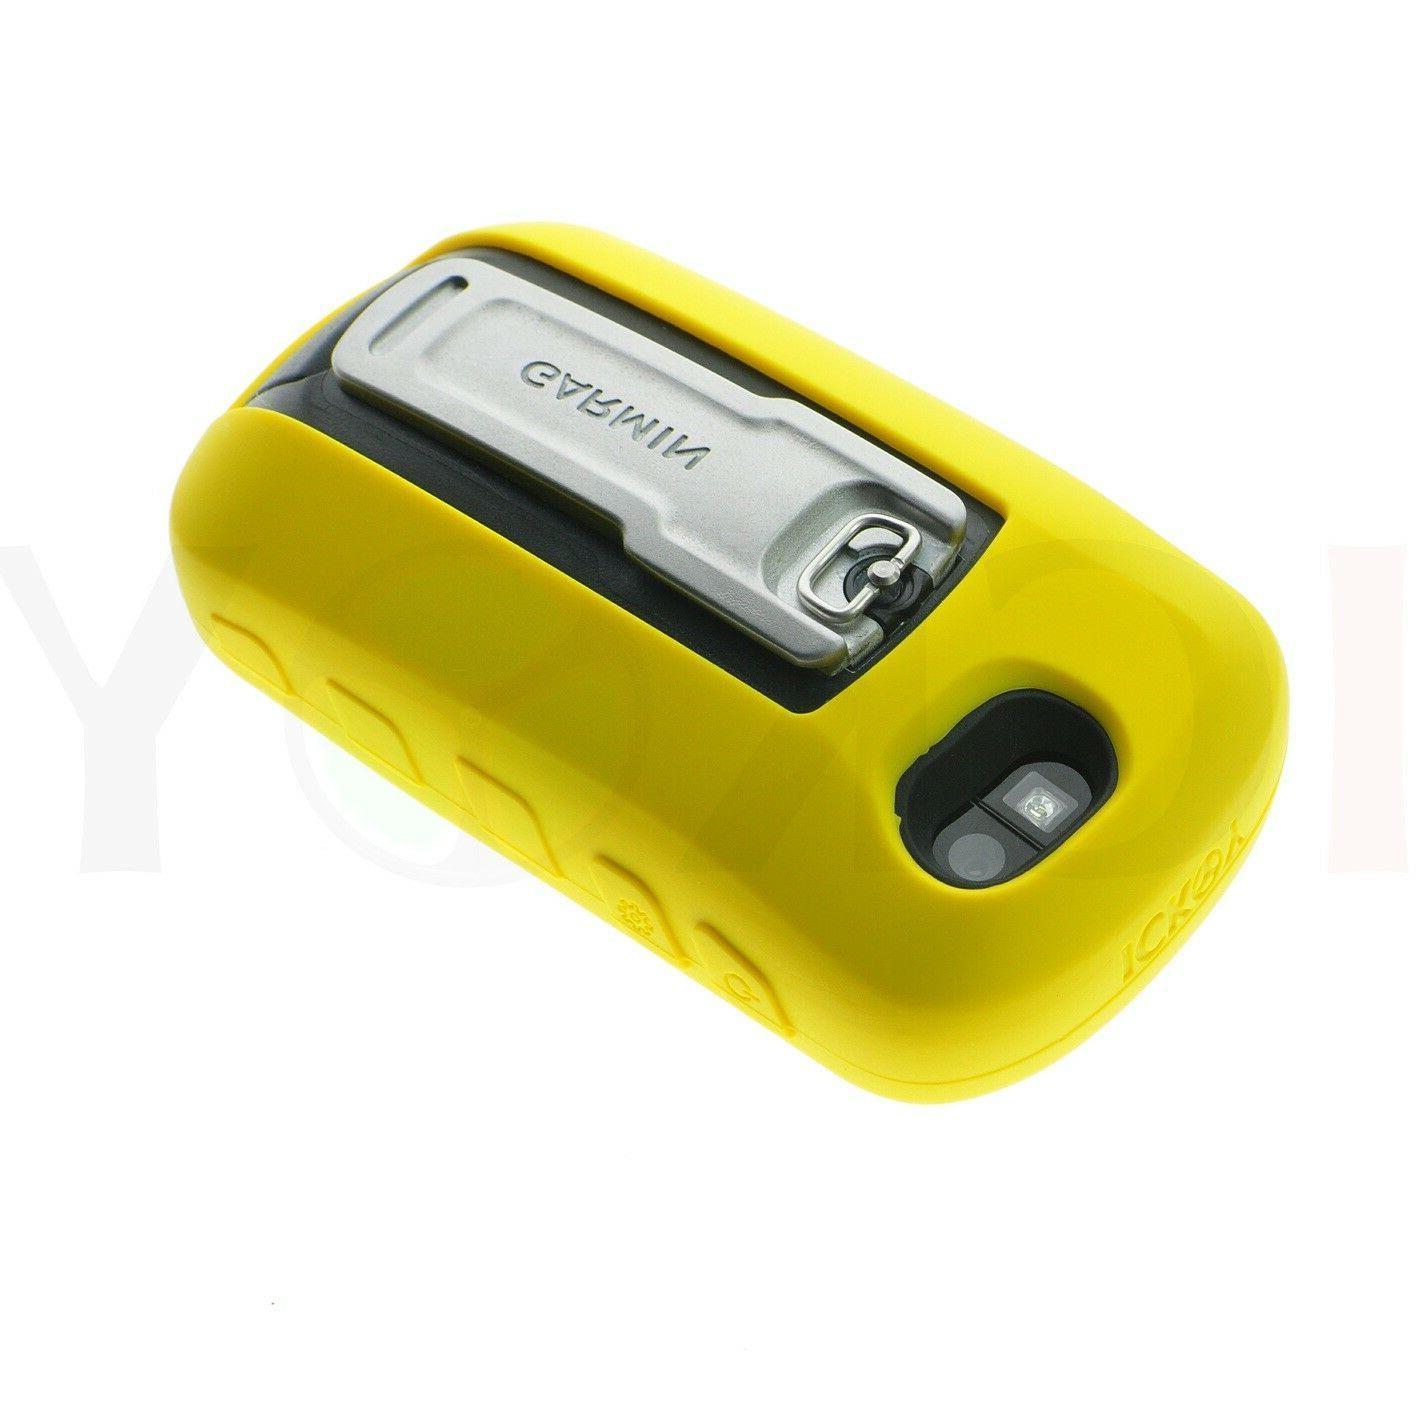 Protect Yellow Case Handheld Oregon 600 650 700 750